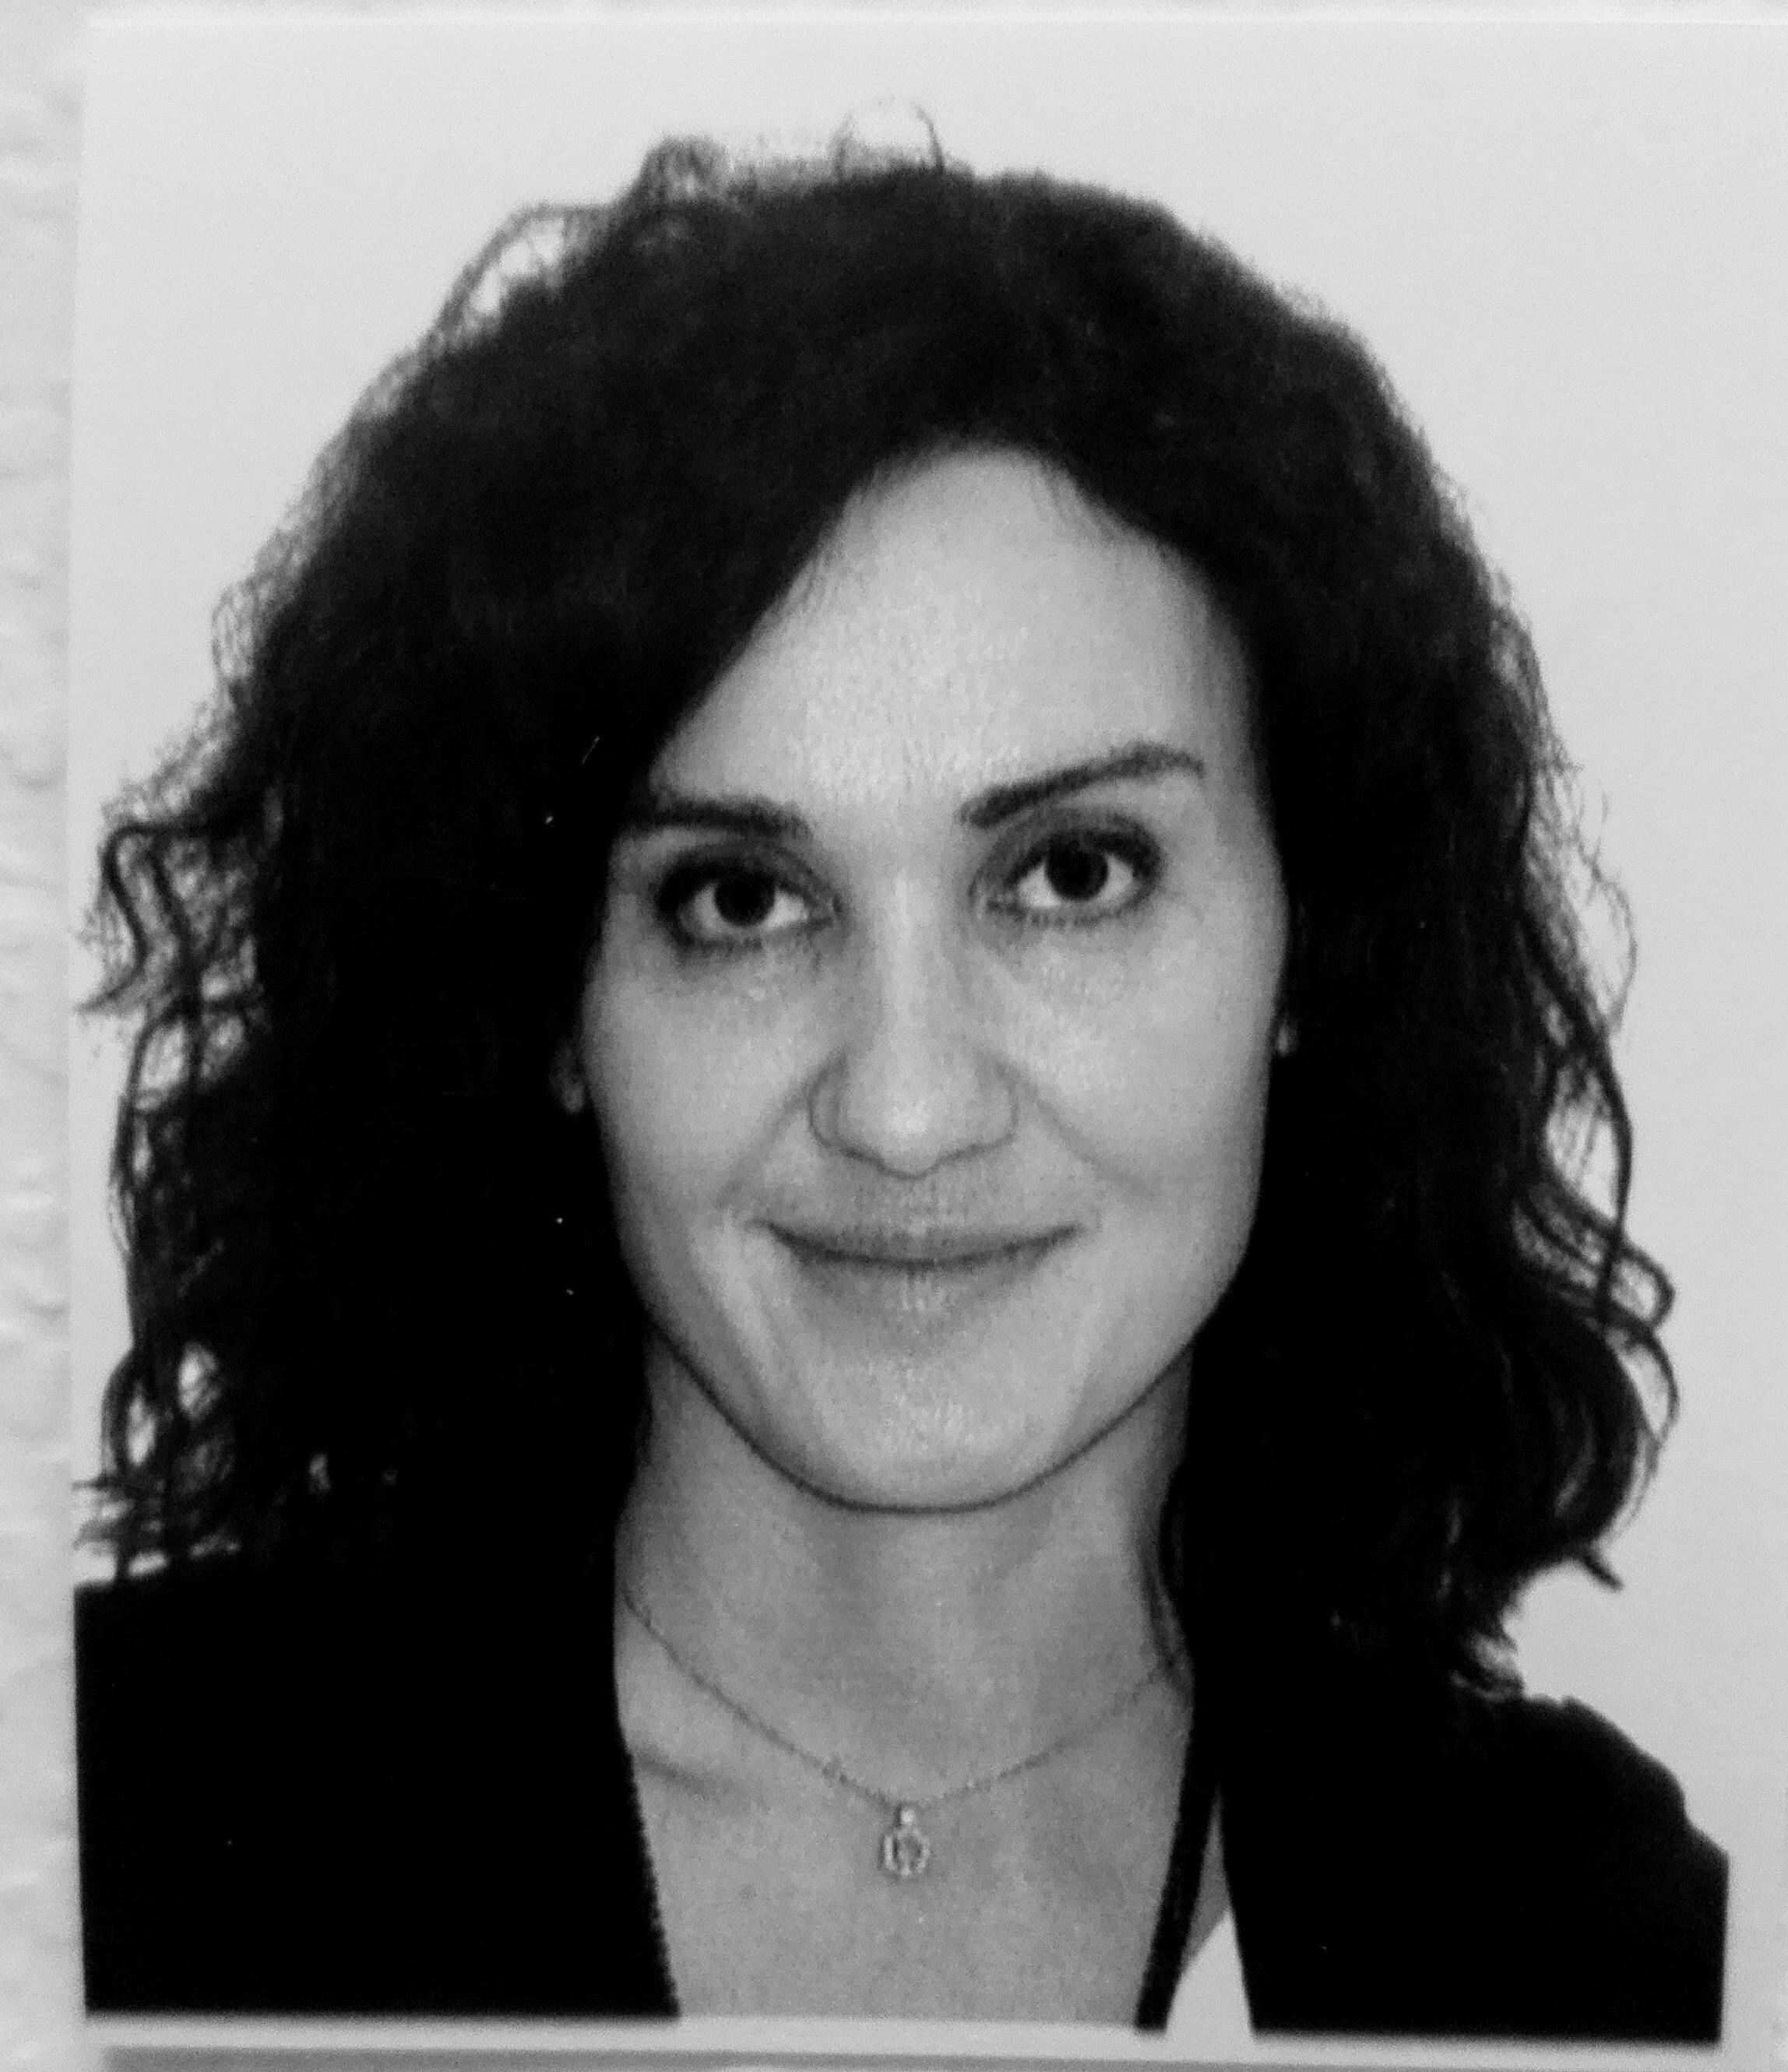 Tiziana Battisti